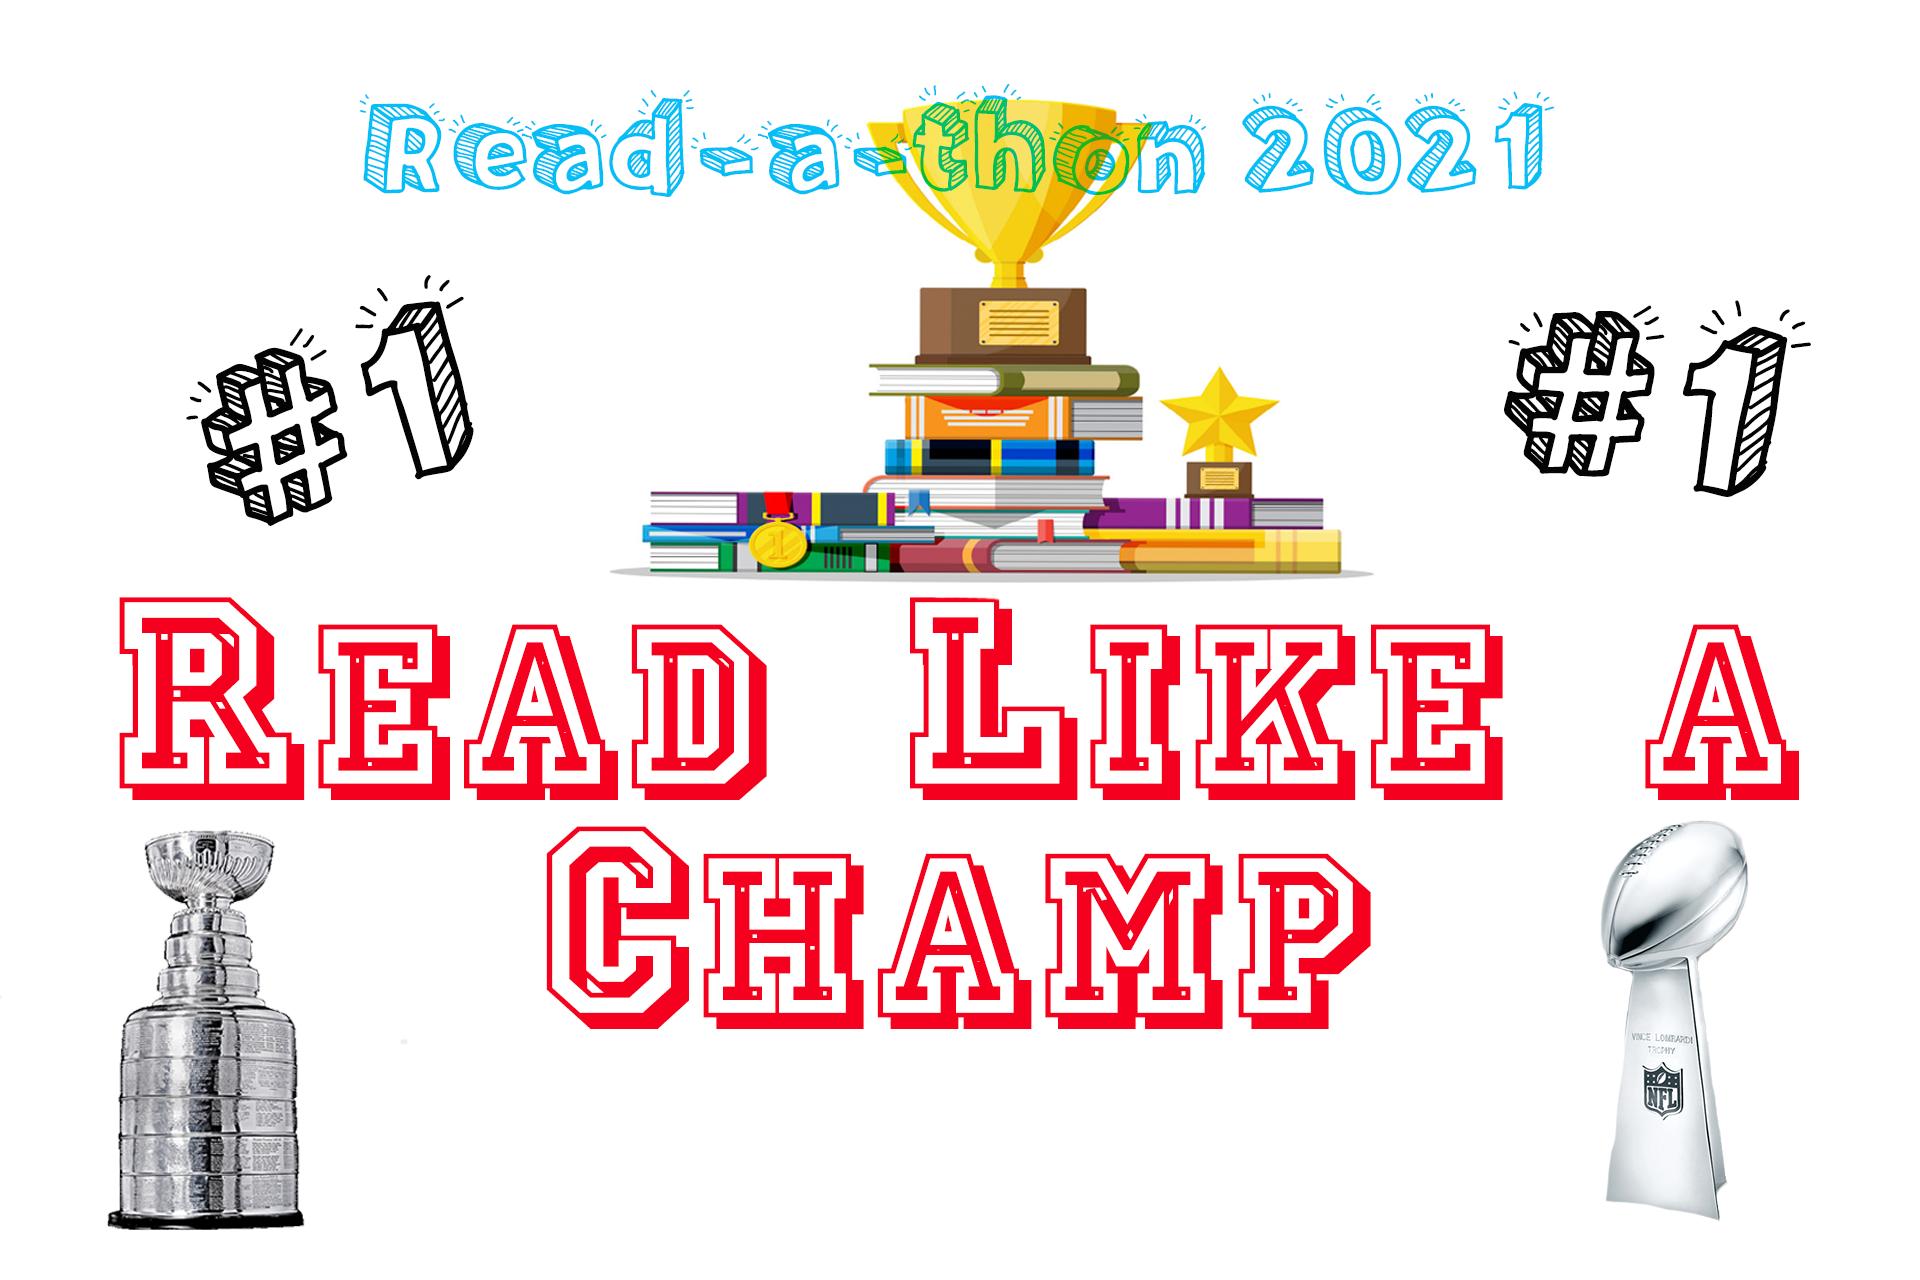 Read Like A Champ